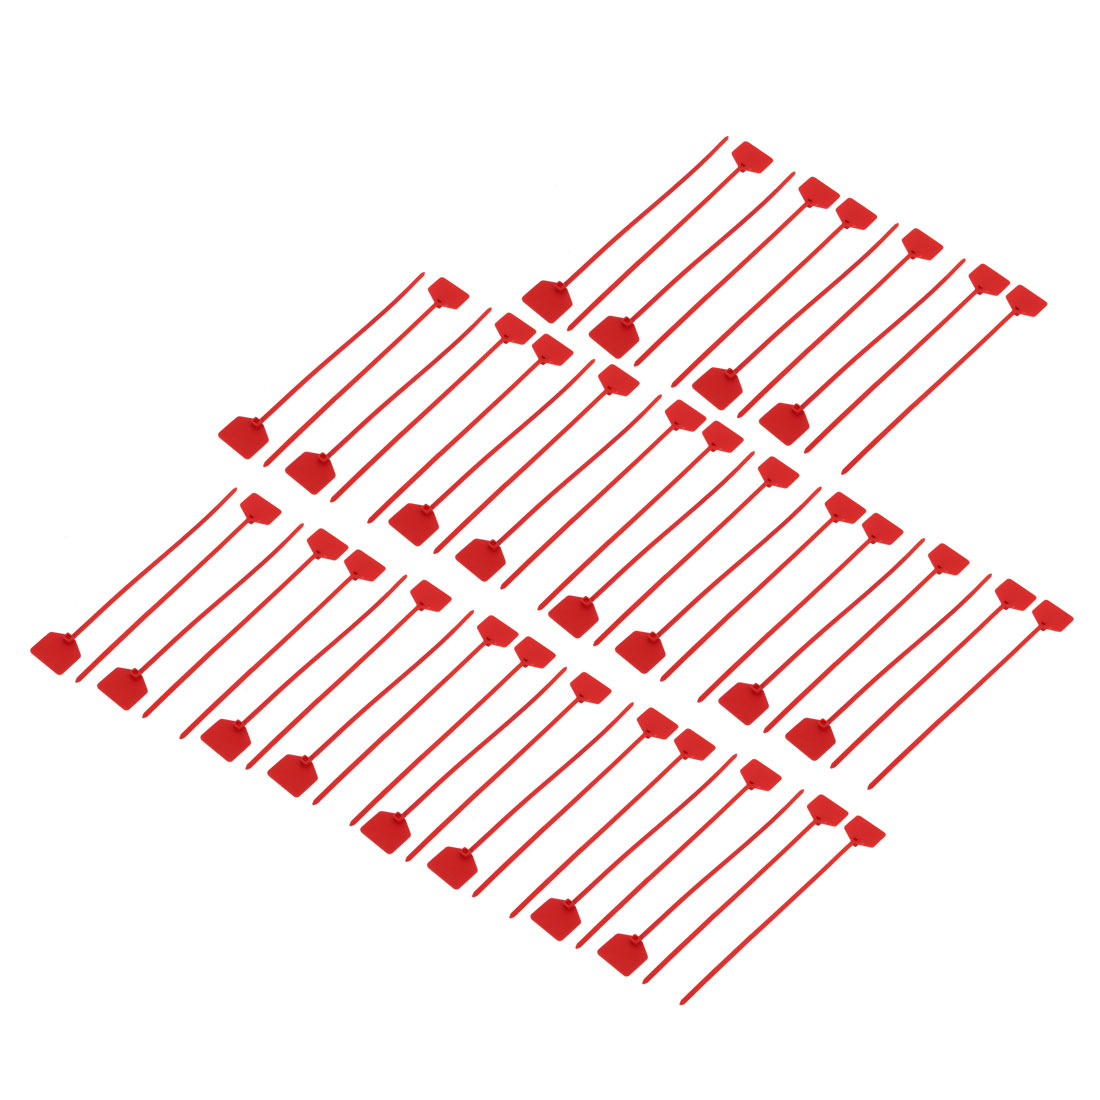 50pcs 220mm Length Nylon Self-Locking 30mm x 20mm Label Cable Tie Zip Red - image 3 de 3